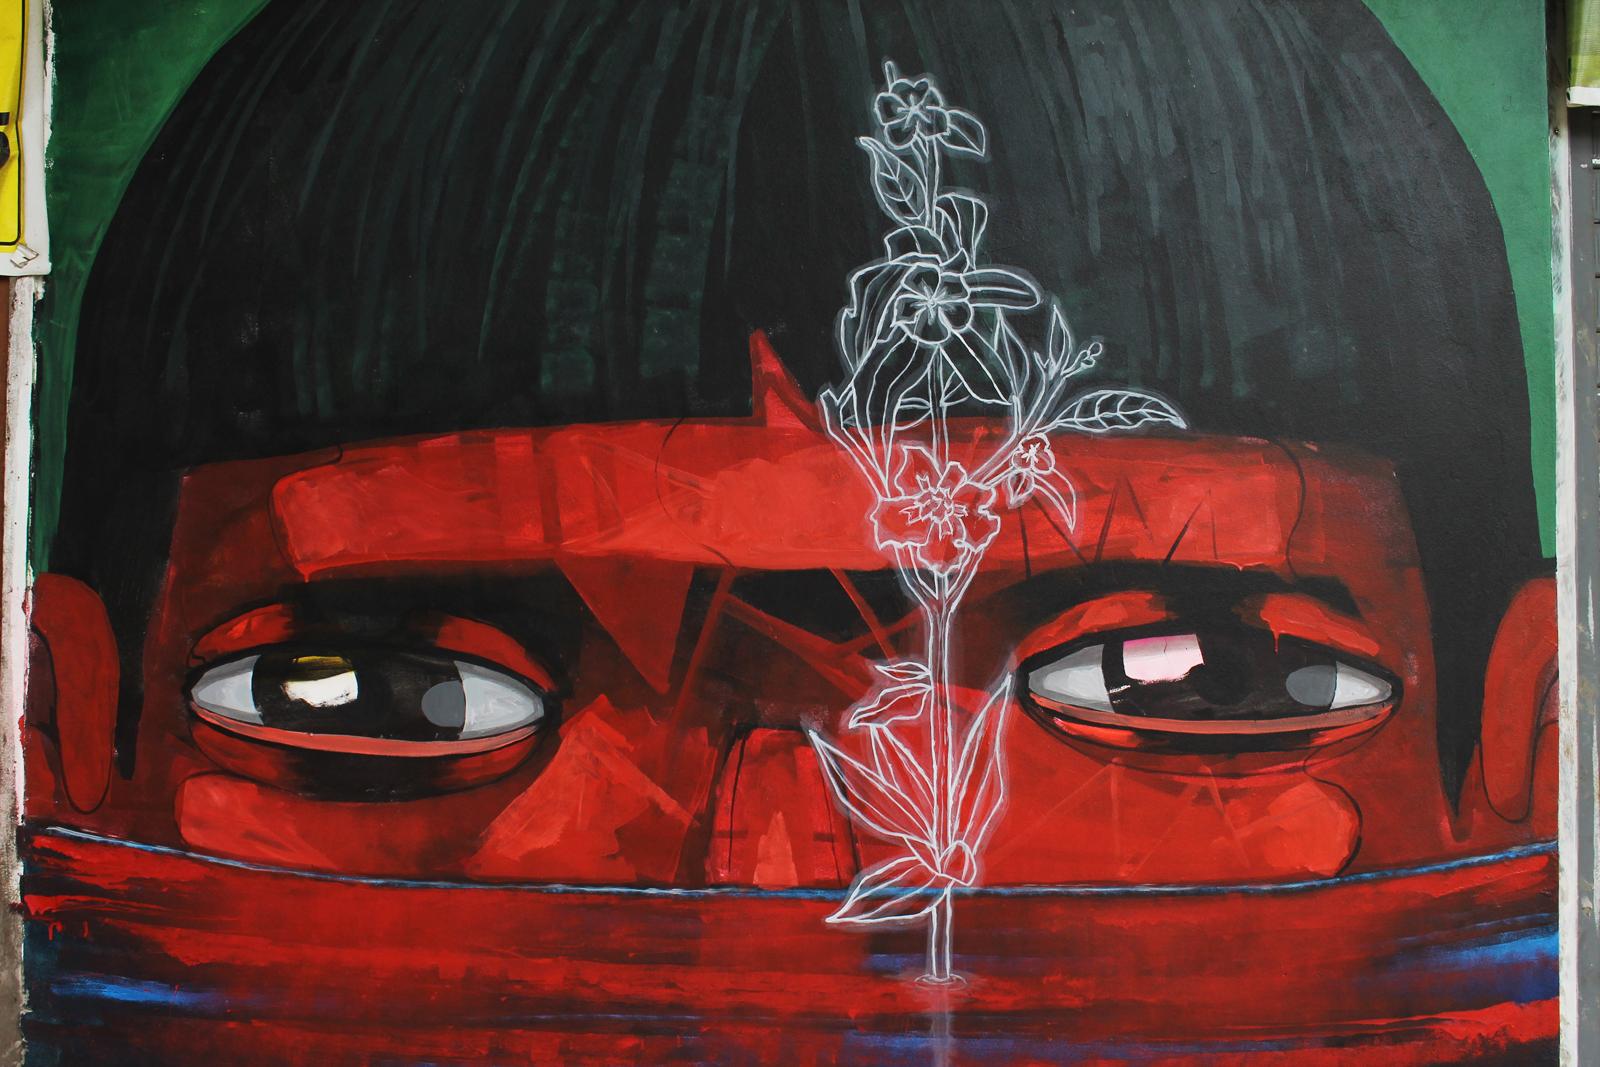 jade-flora-new-mural-in-puerto-maldonado-02